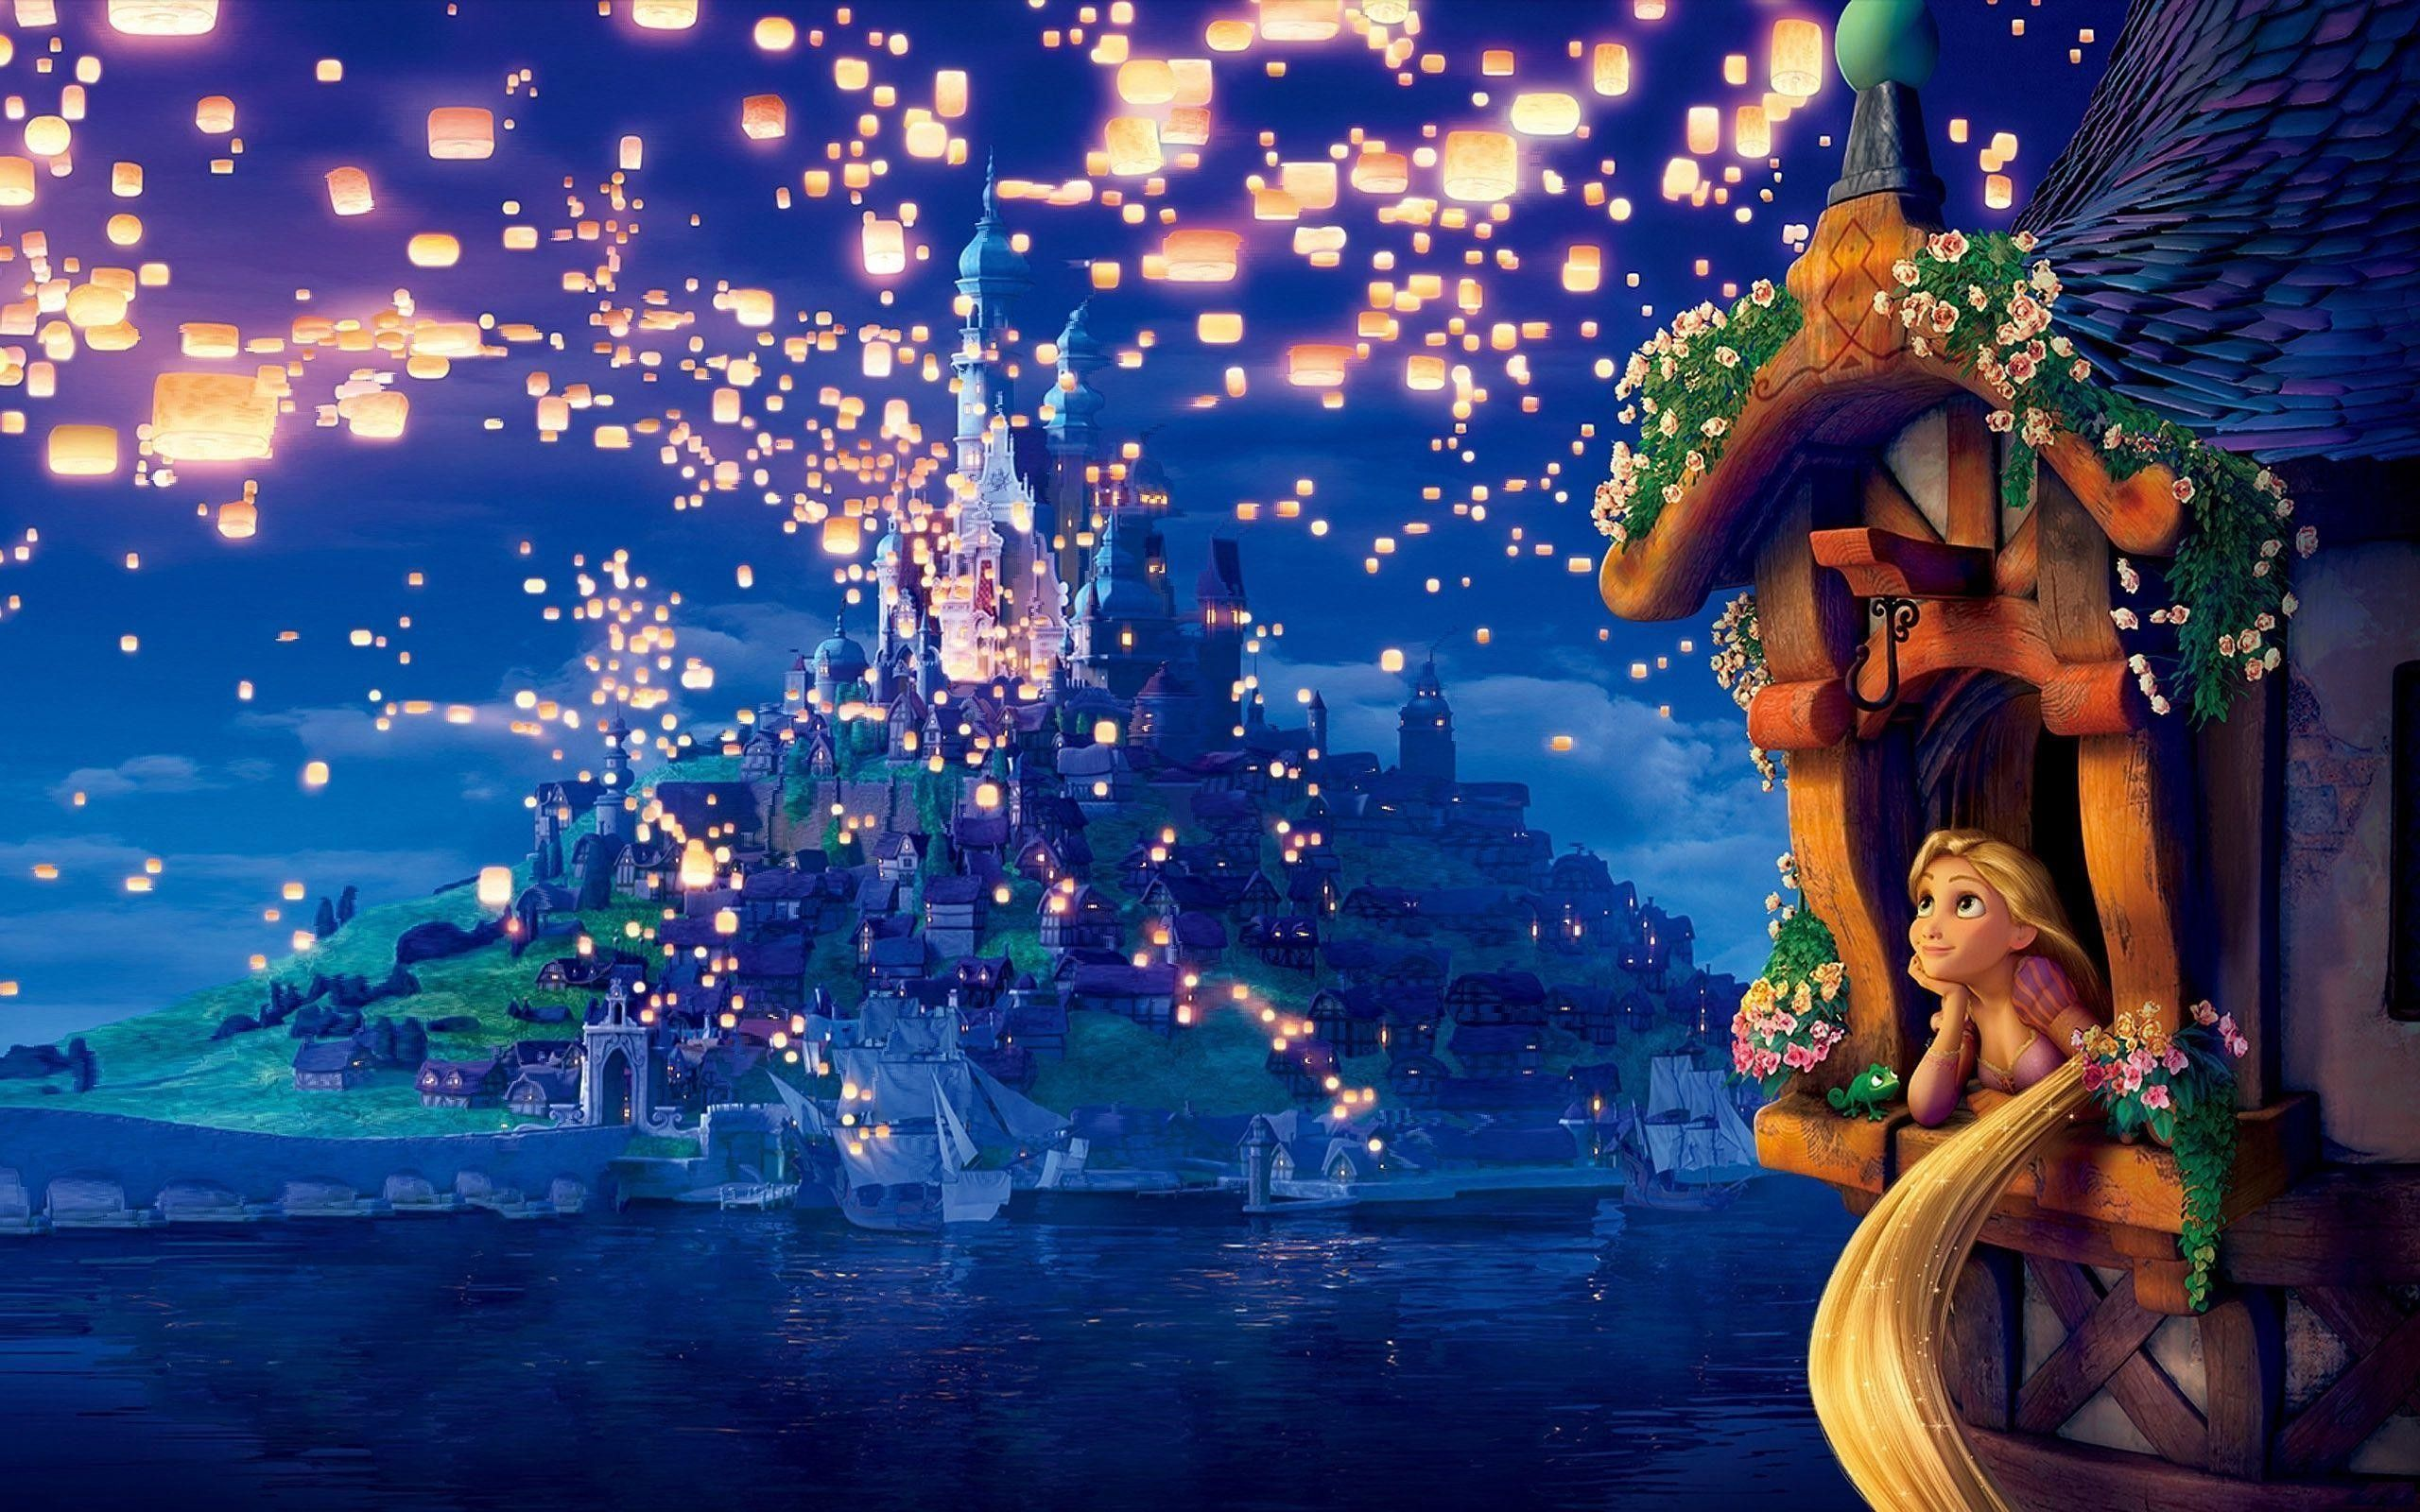 Rapunzel Wallpaper Hd 70 Images Disney Desktop Wallpaper Tangled Wallpaper Disney Background